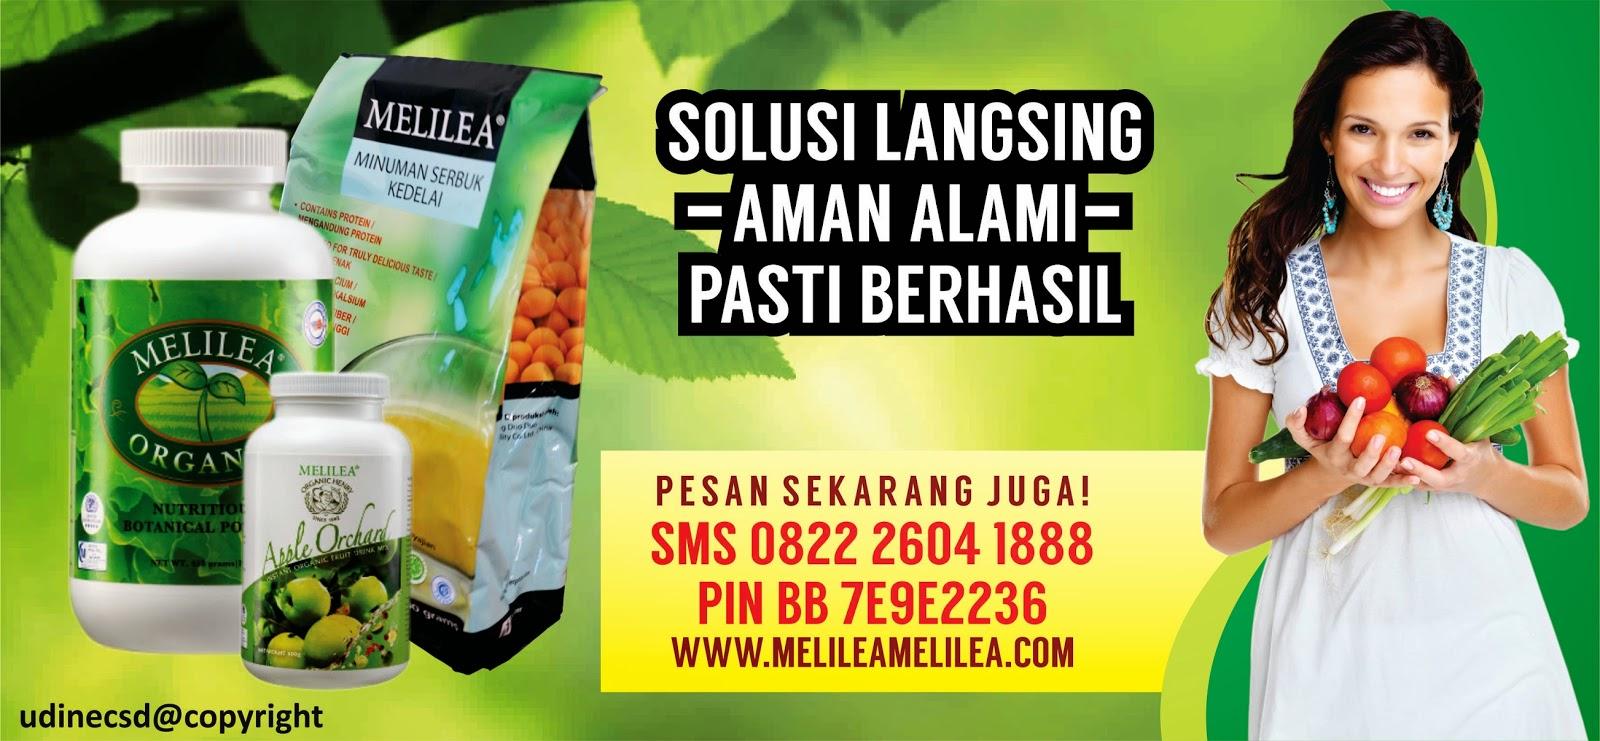 082226041888 Melilea Bandungmelilea Bandung Supermallmelilea Susu Kedelai Organik Serbuk 0822 2604 1888 Skin Care Indonesia